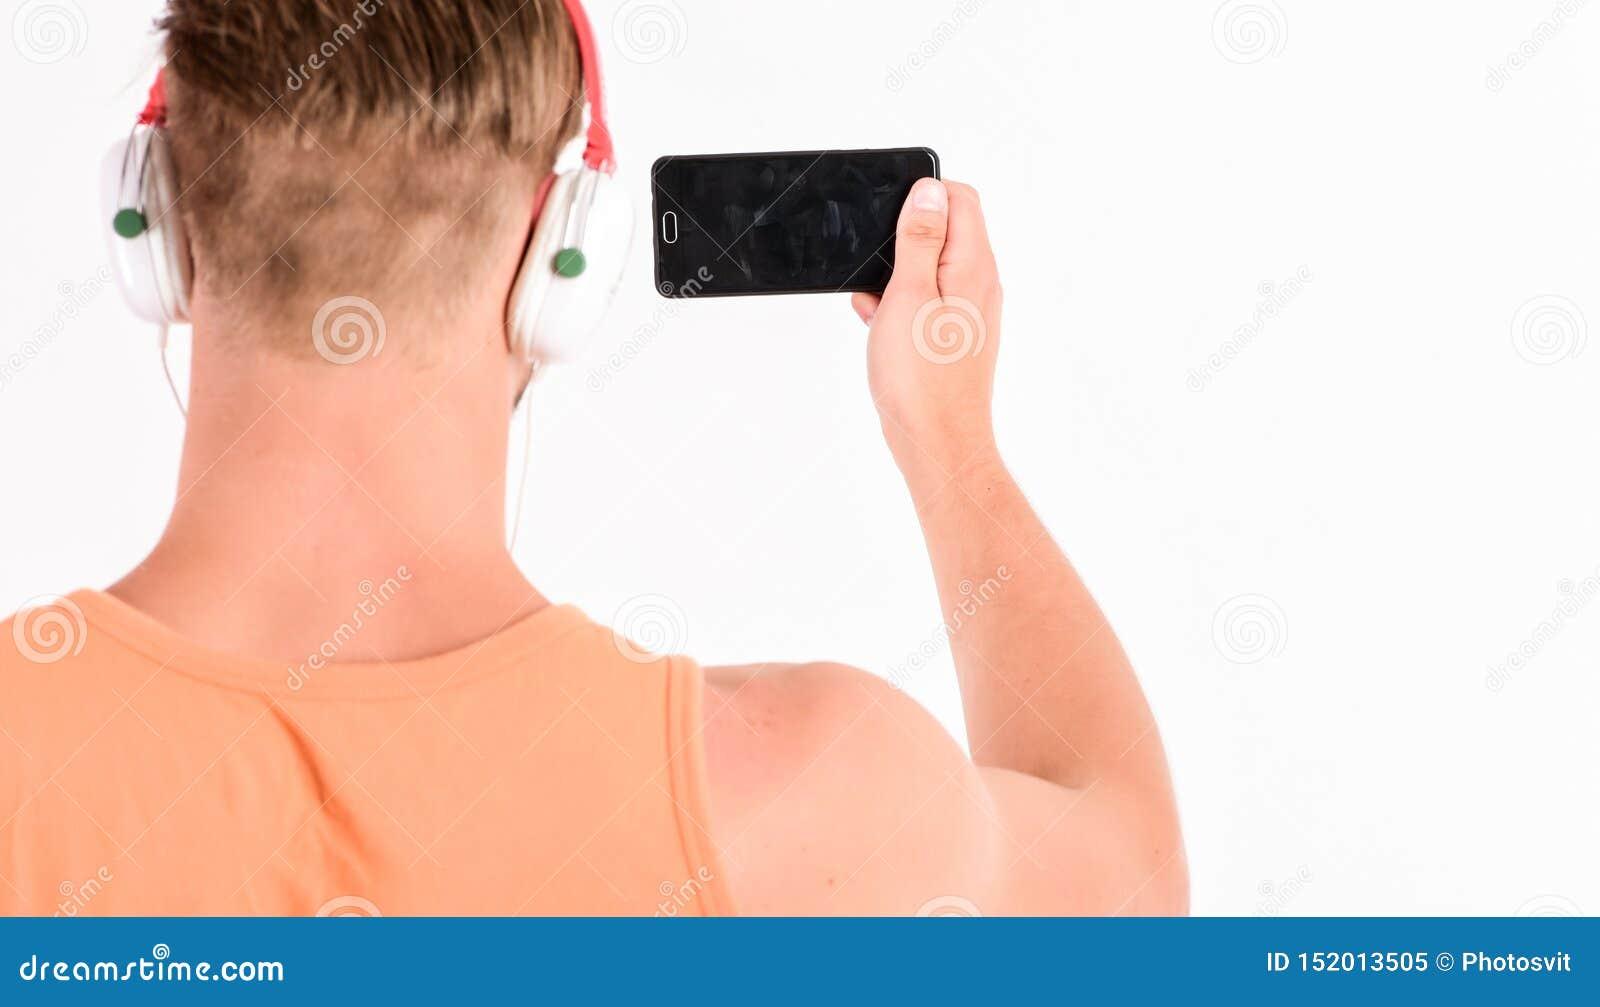 Man listen music headphones and smartphone white background. Modern technology. Music application concept. Enjoy perfect